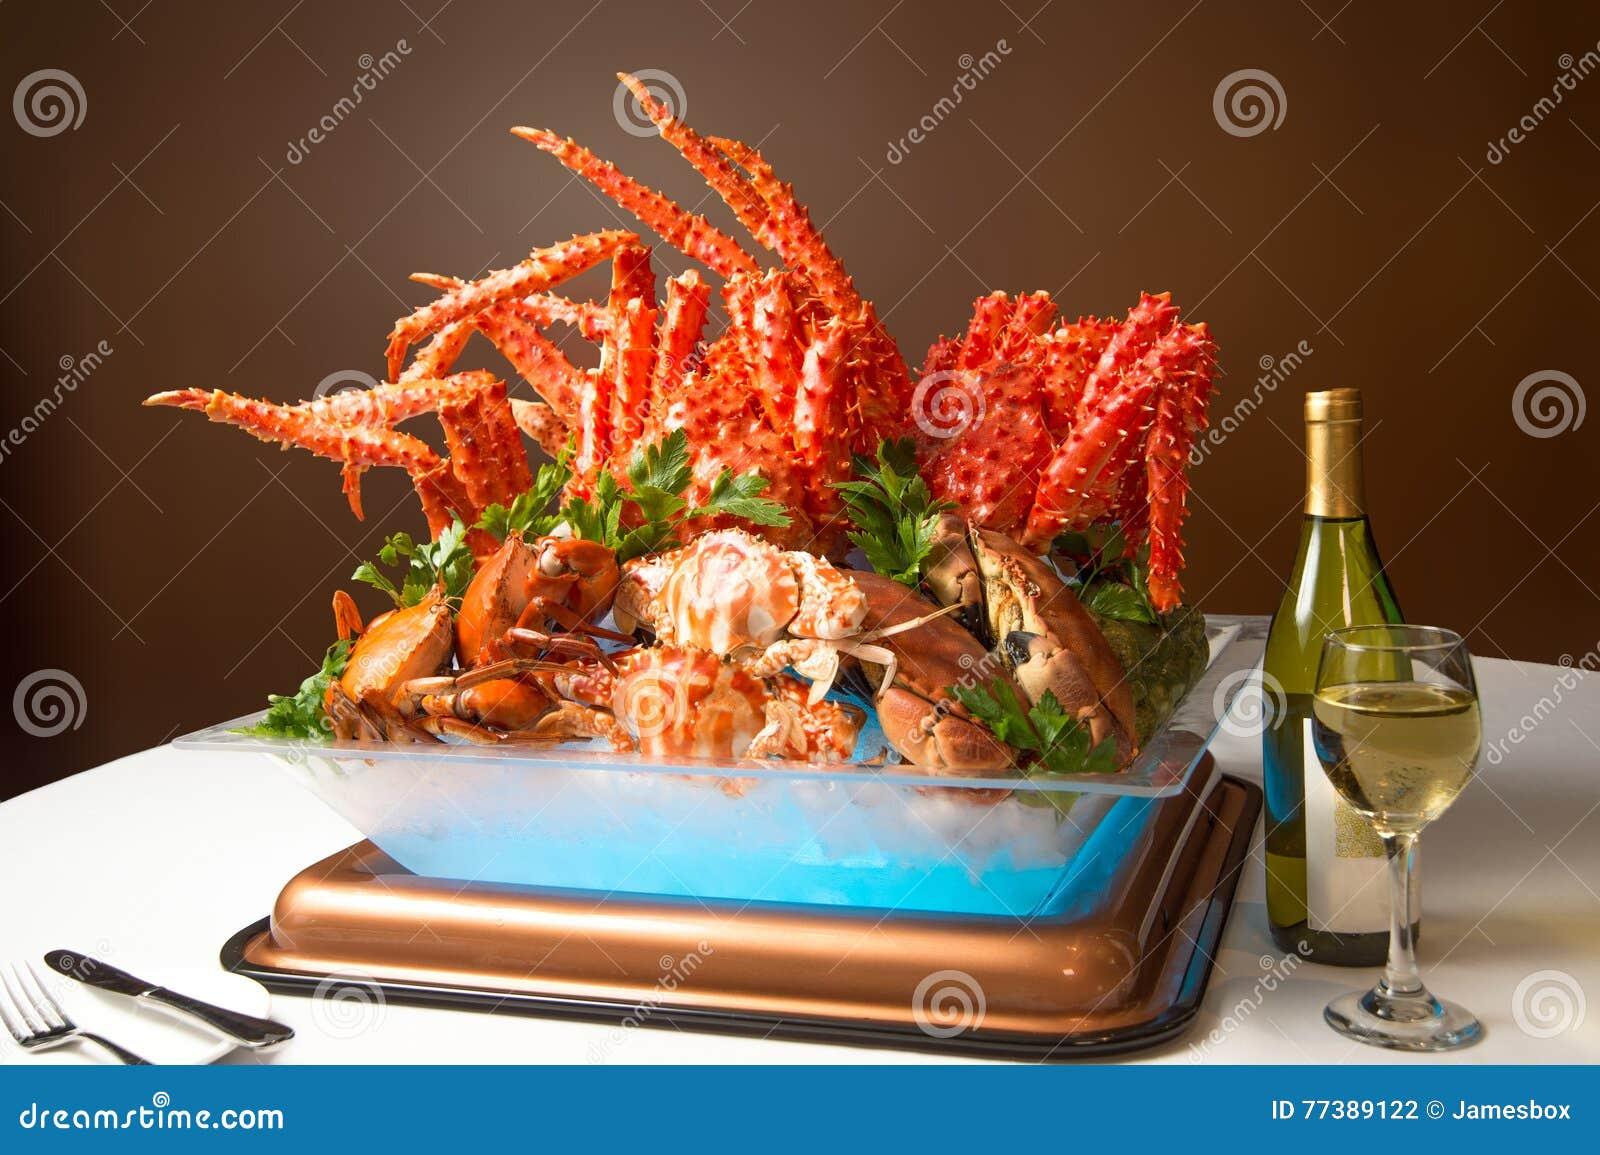 Summer Crab Feast Dinner Buffet To Enjoy Alaska King Crab